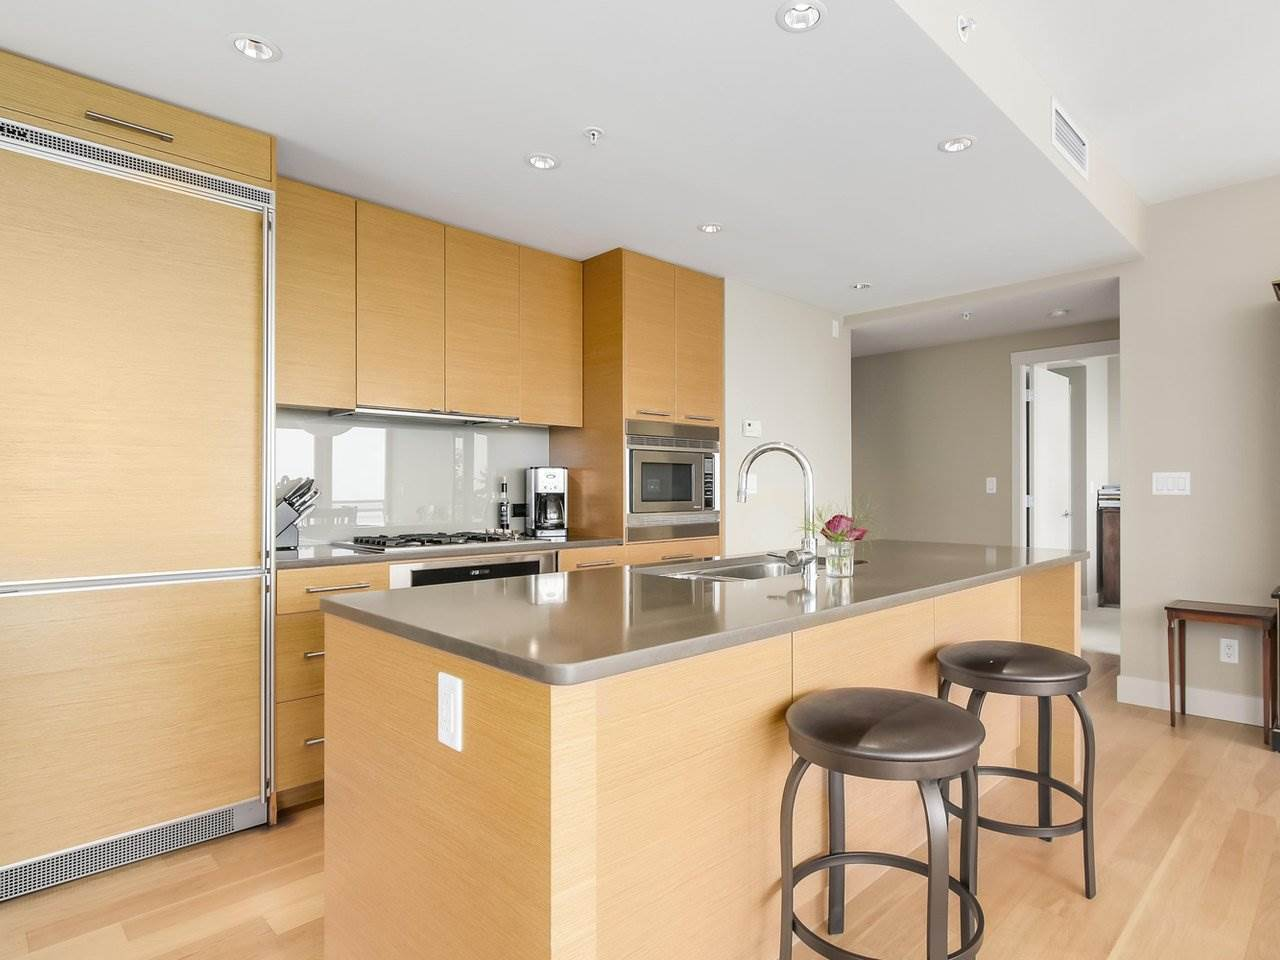 Condo Apartment at 802 15152 RUSSELL AVENUE, Unit 802, South Surrey White Rock, British Columbia. Image 8